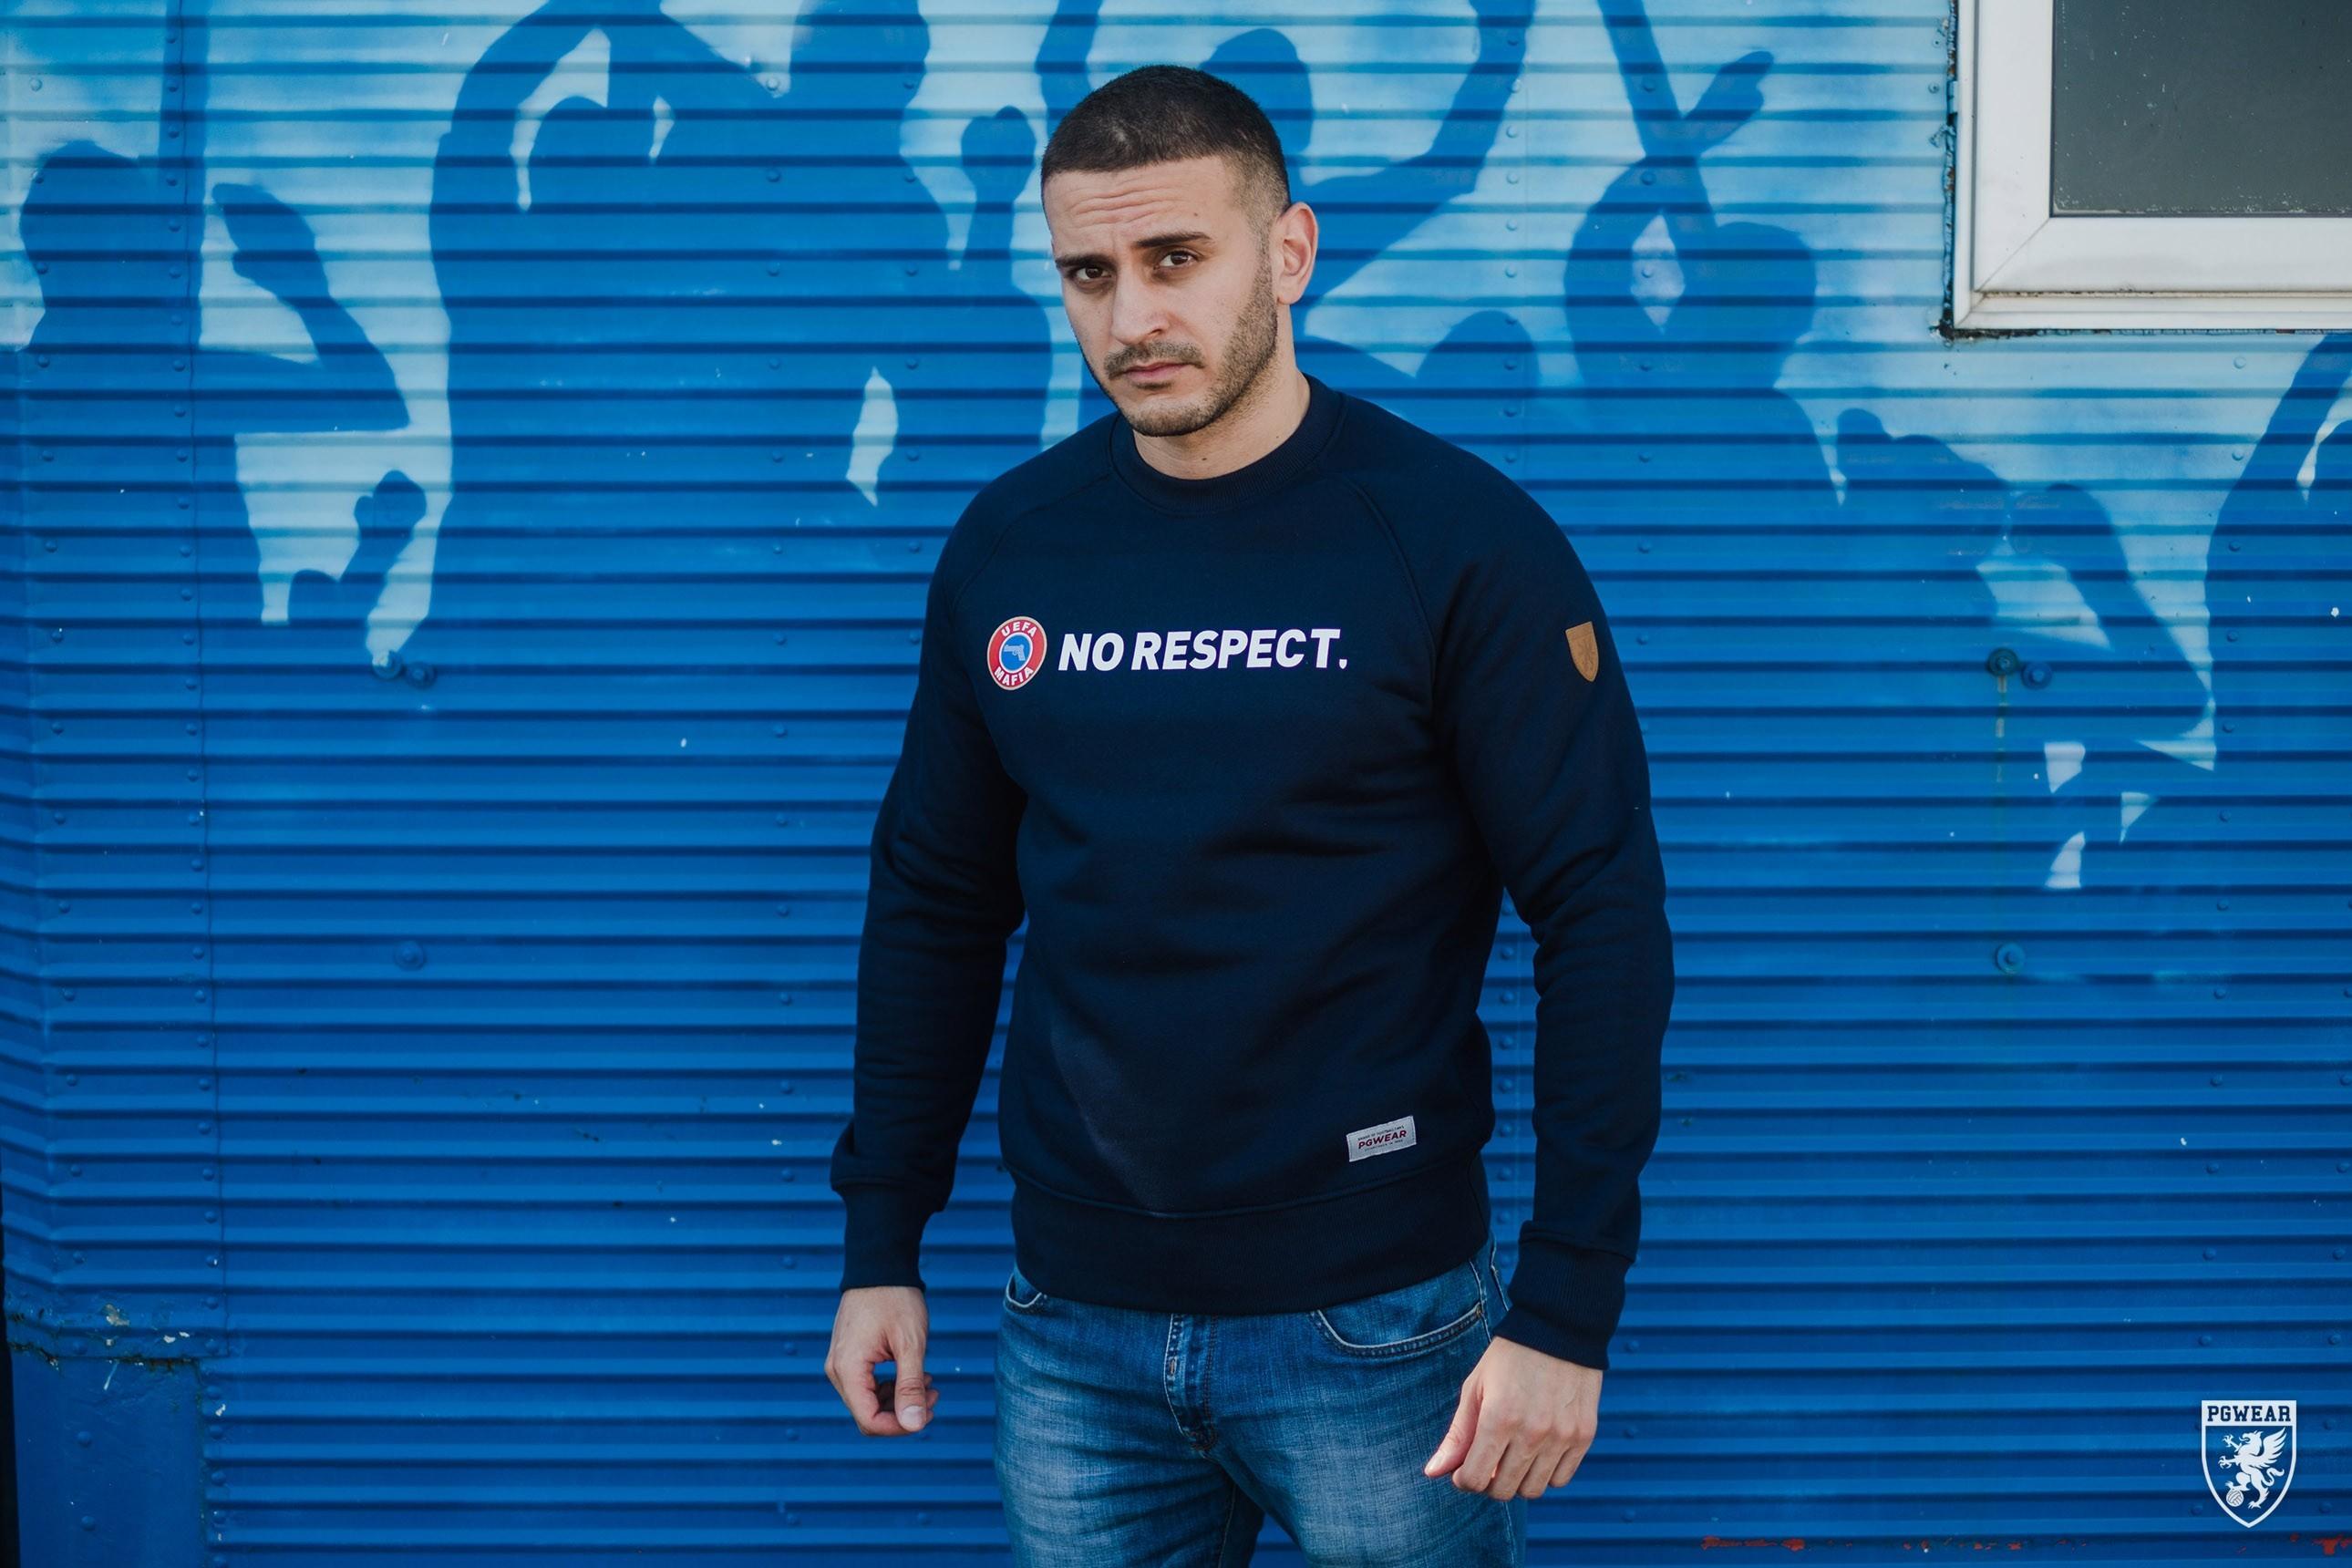 AW17 Bluza No Respect S